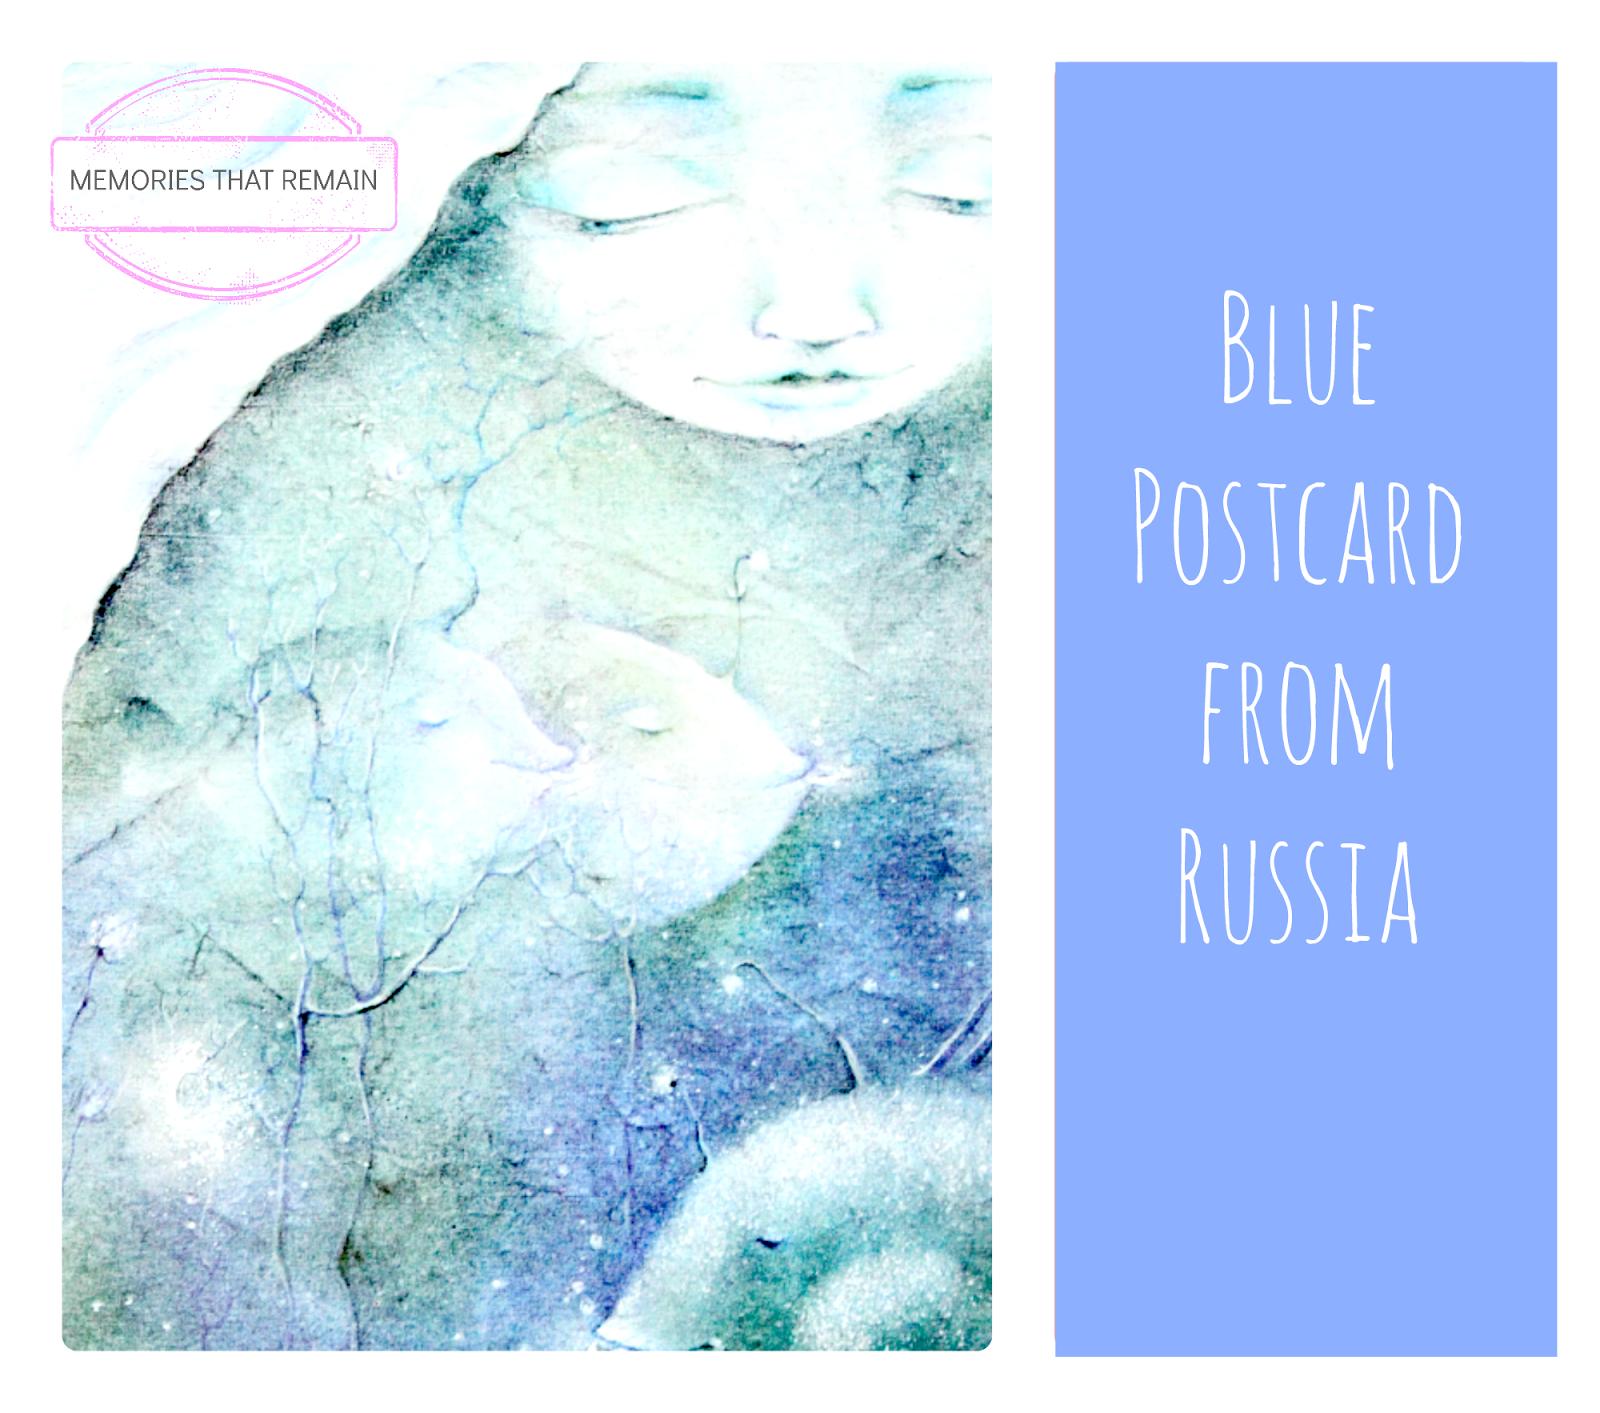 Russia blue postcard